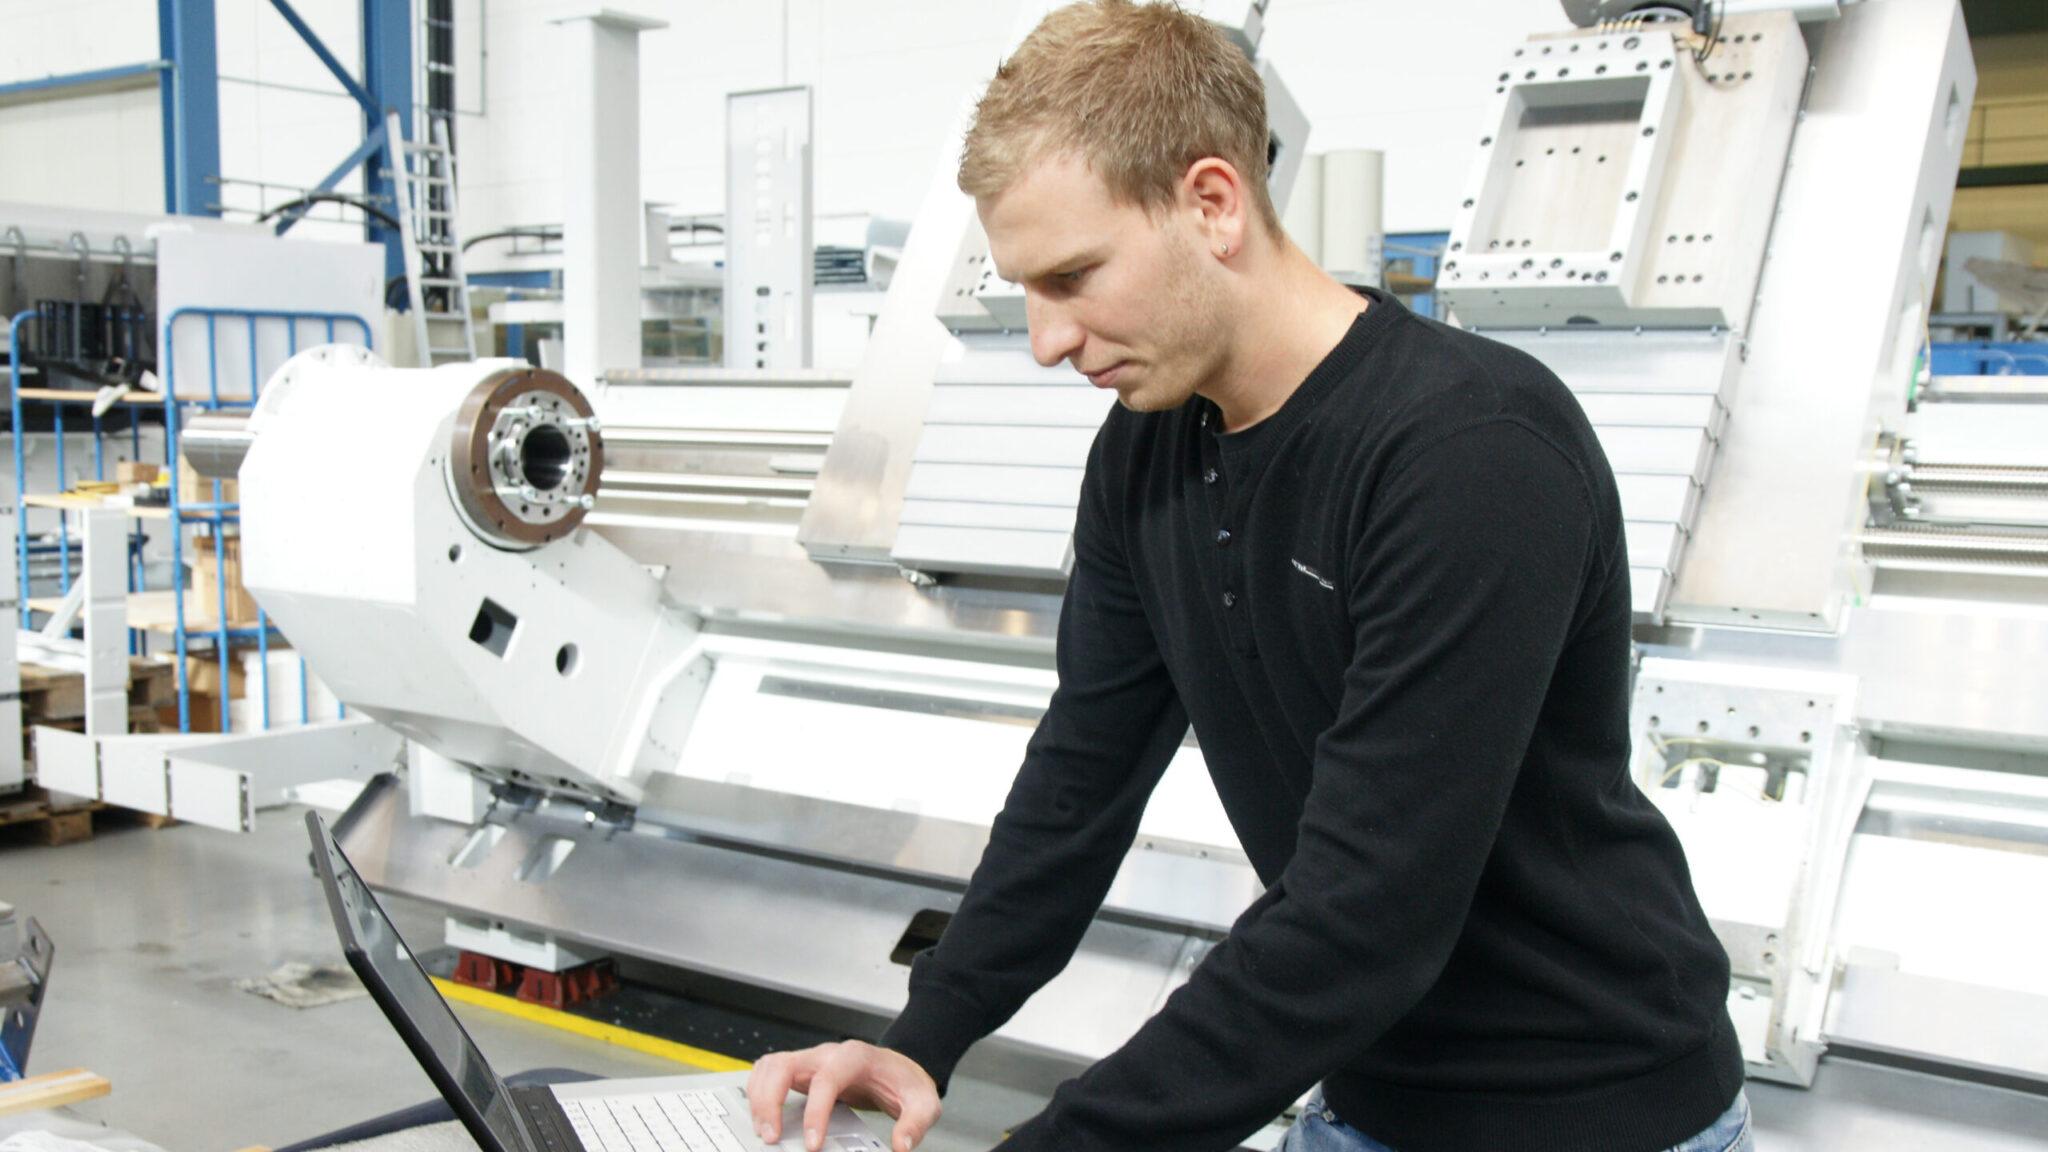 Werkzeugmaschinenbau Service: Schulung-Programmierung / Machine Tool Service: Training-Programming